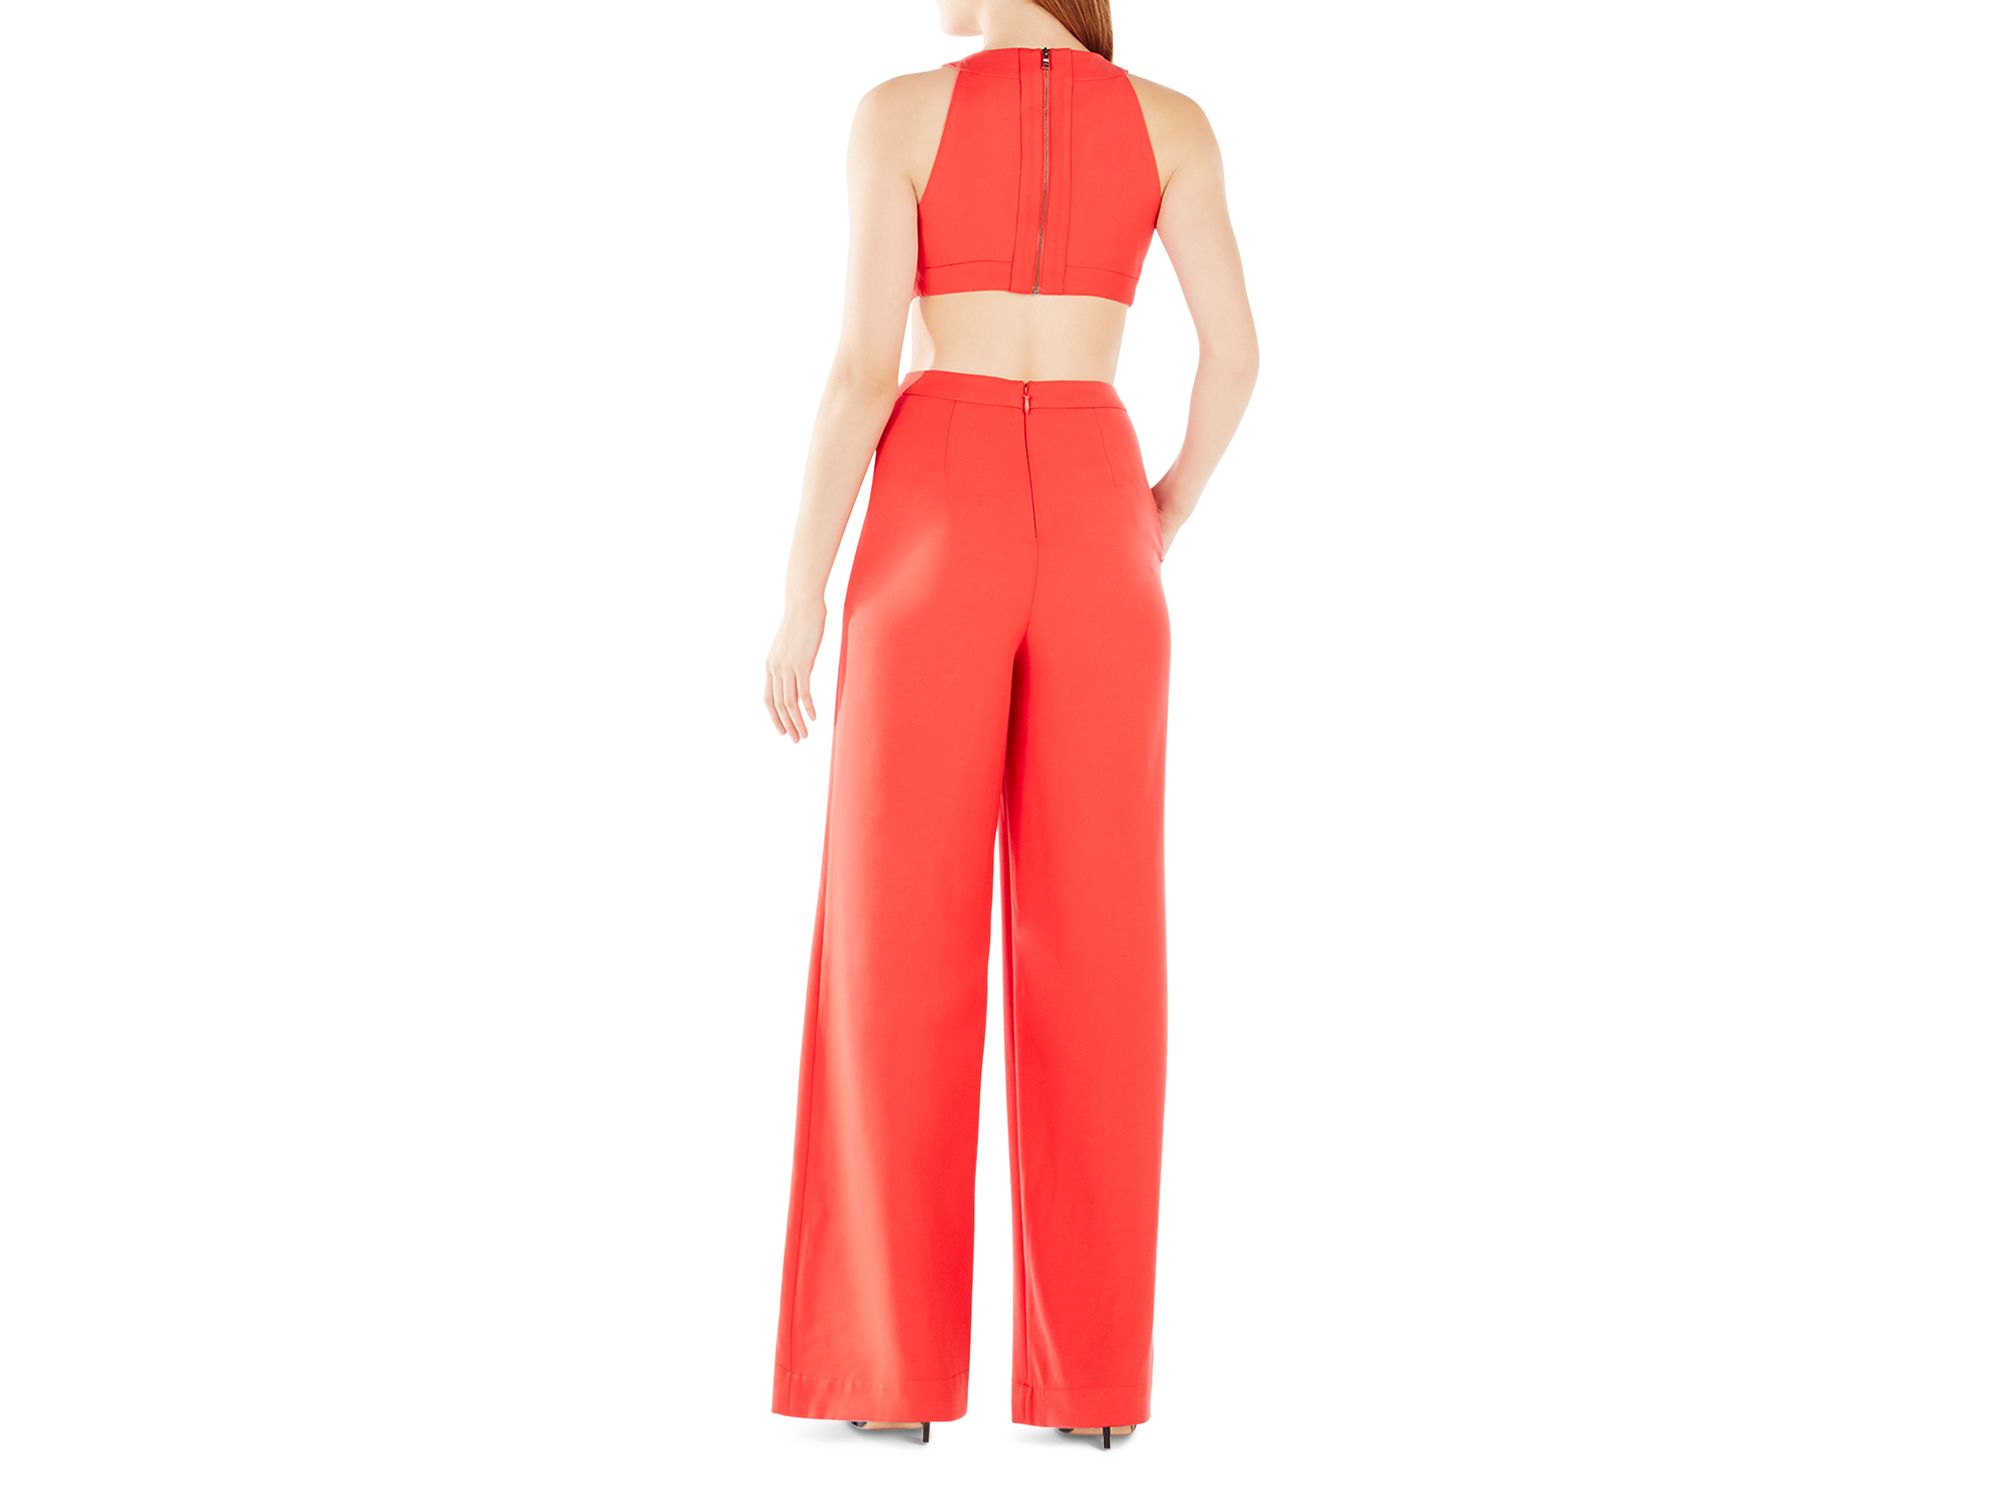 9f070e1f671c Lyst - BCBGMAXAZRIA Emjay Cutout Jumpsuit in Red